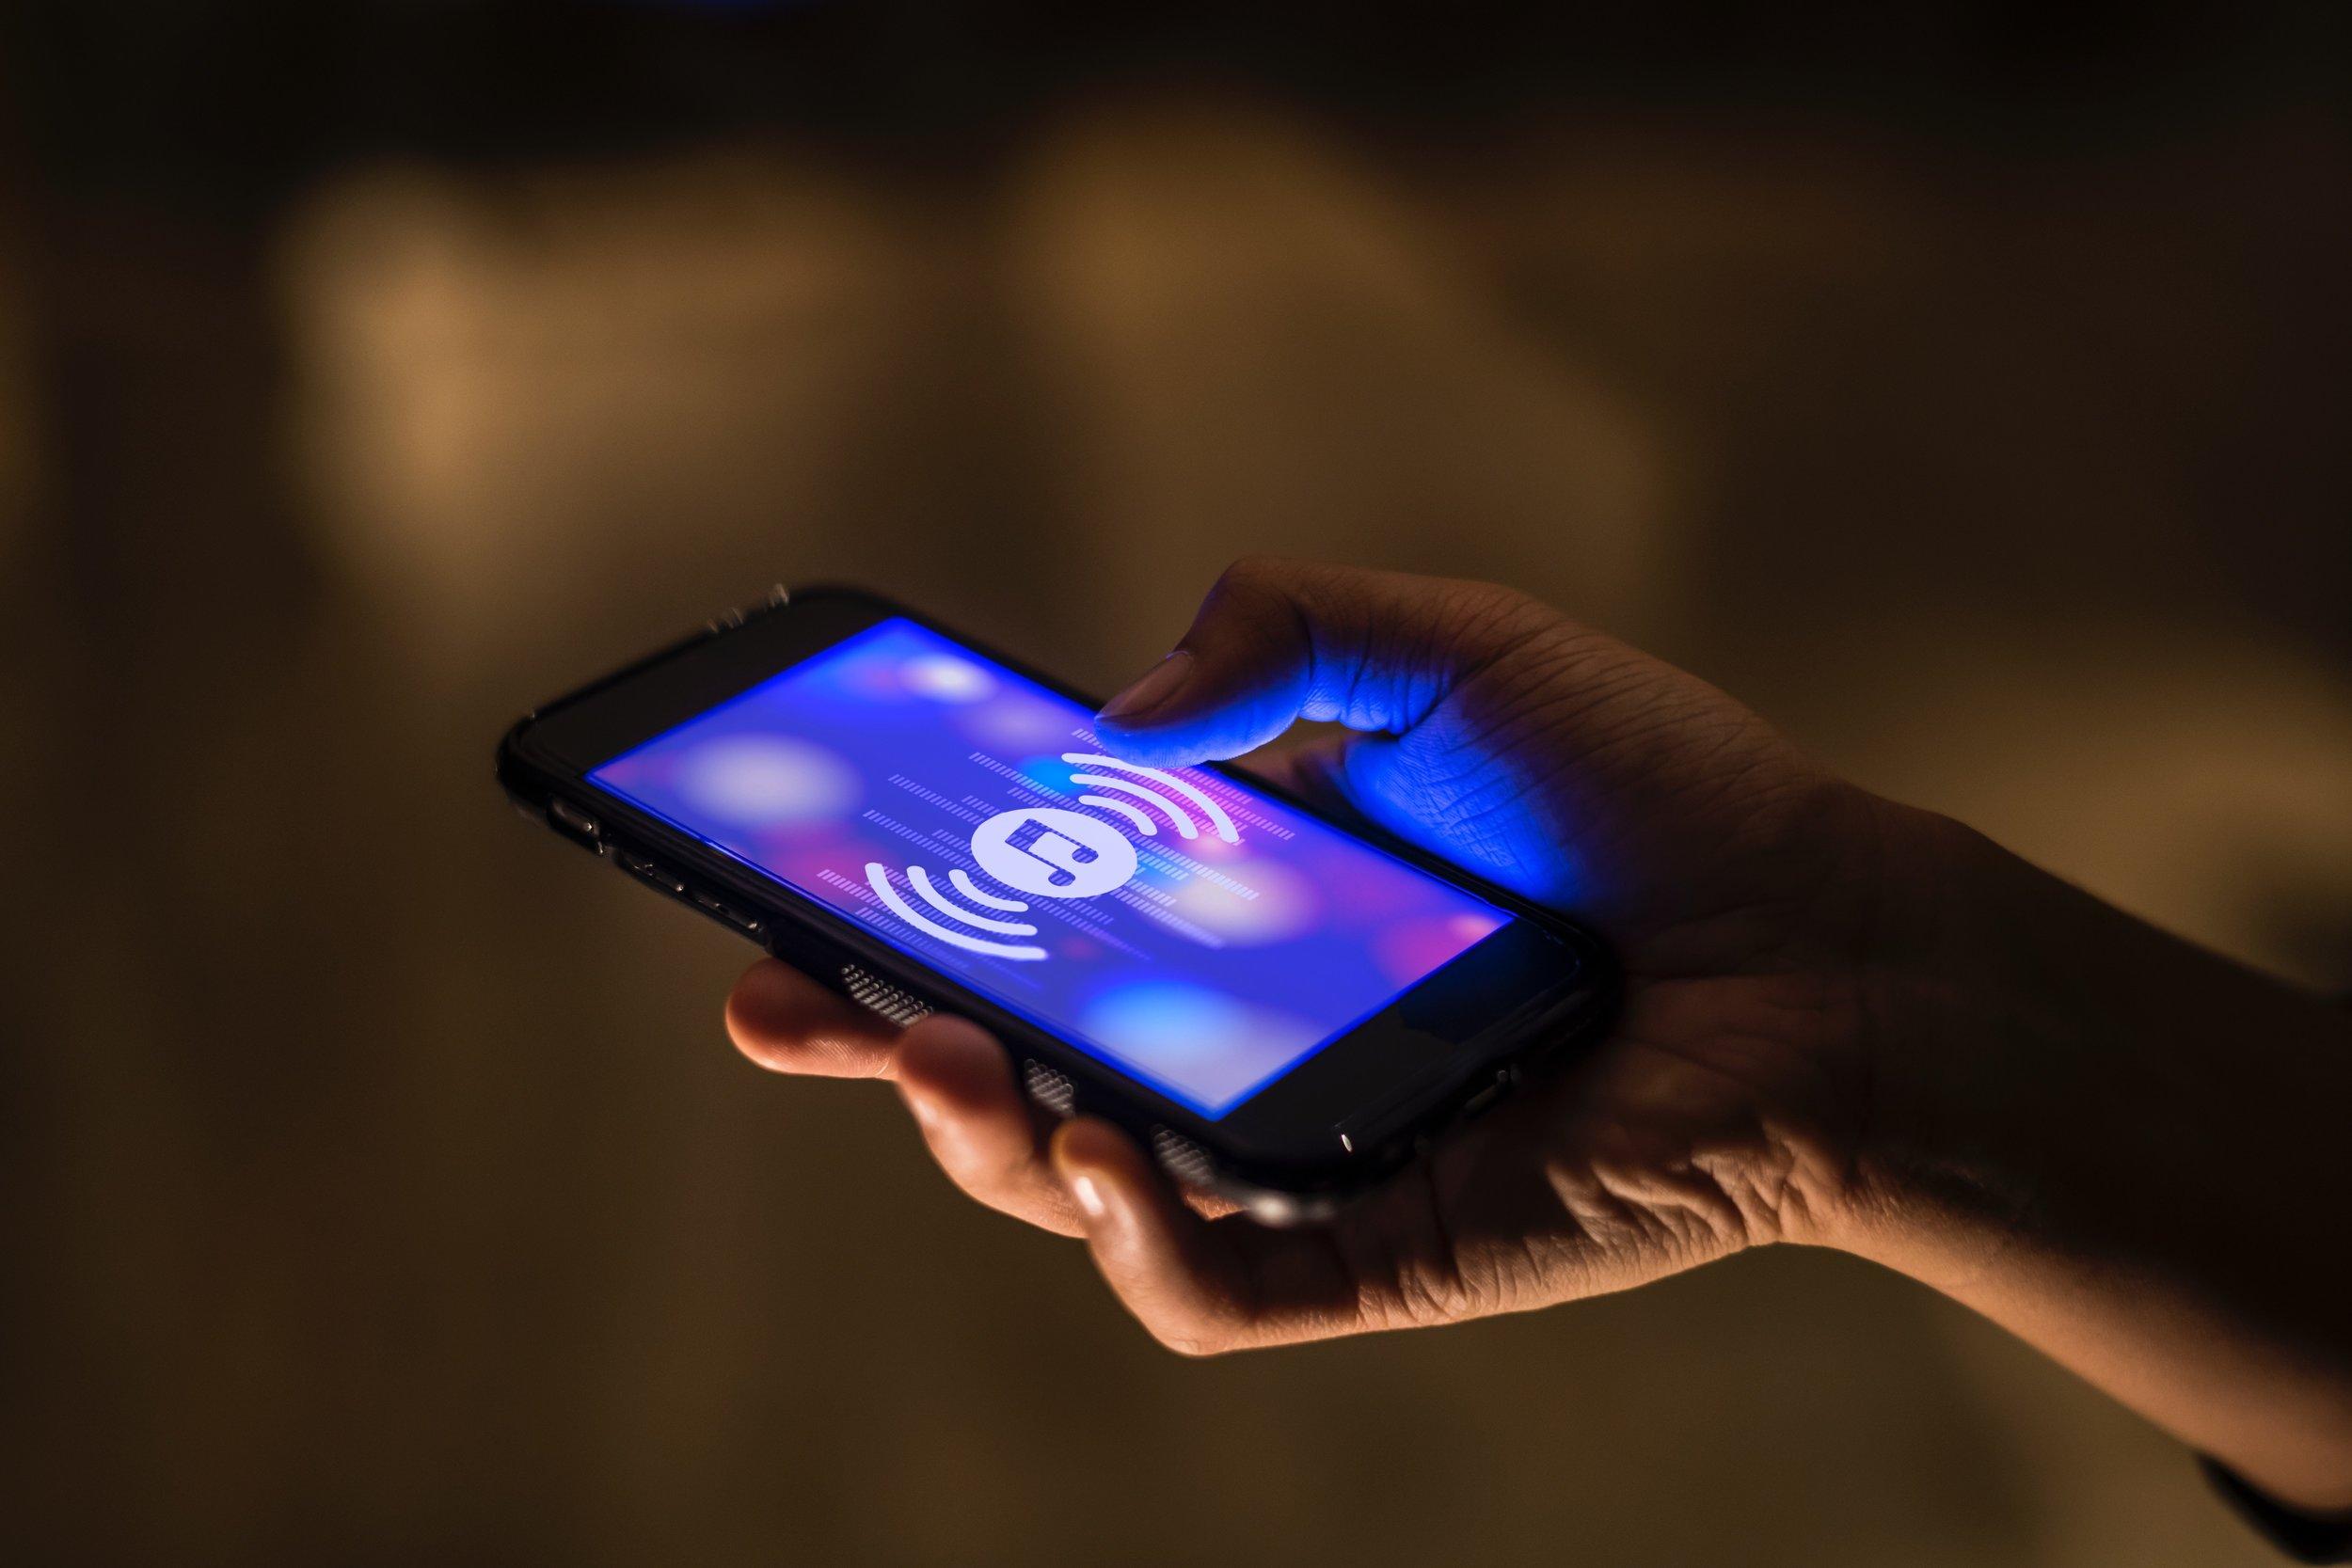 phone-music-streaming-rawpixel-769303-unsplash.jpg